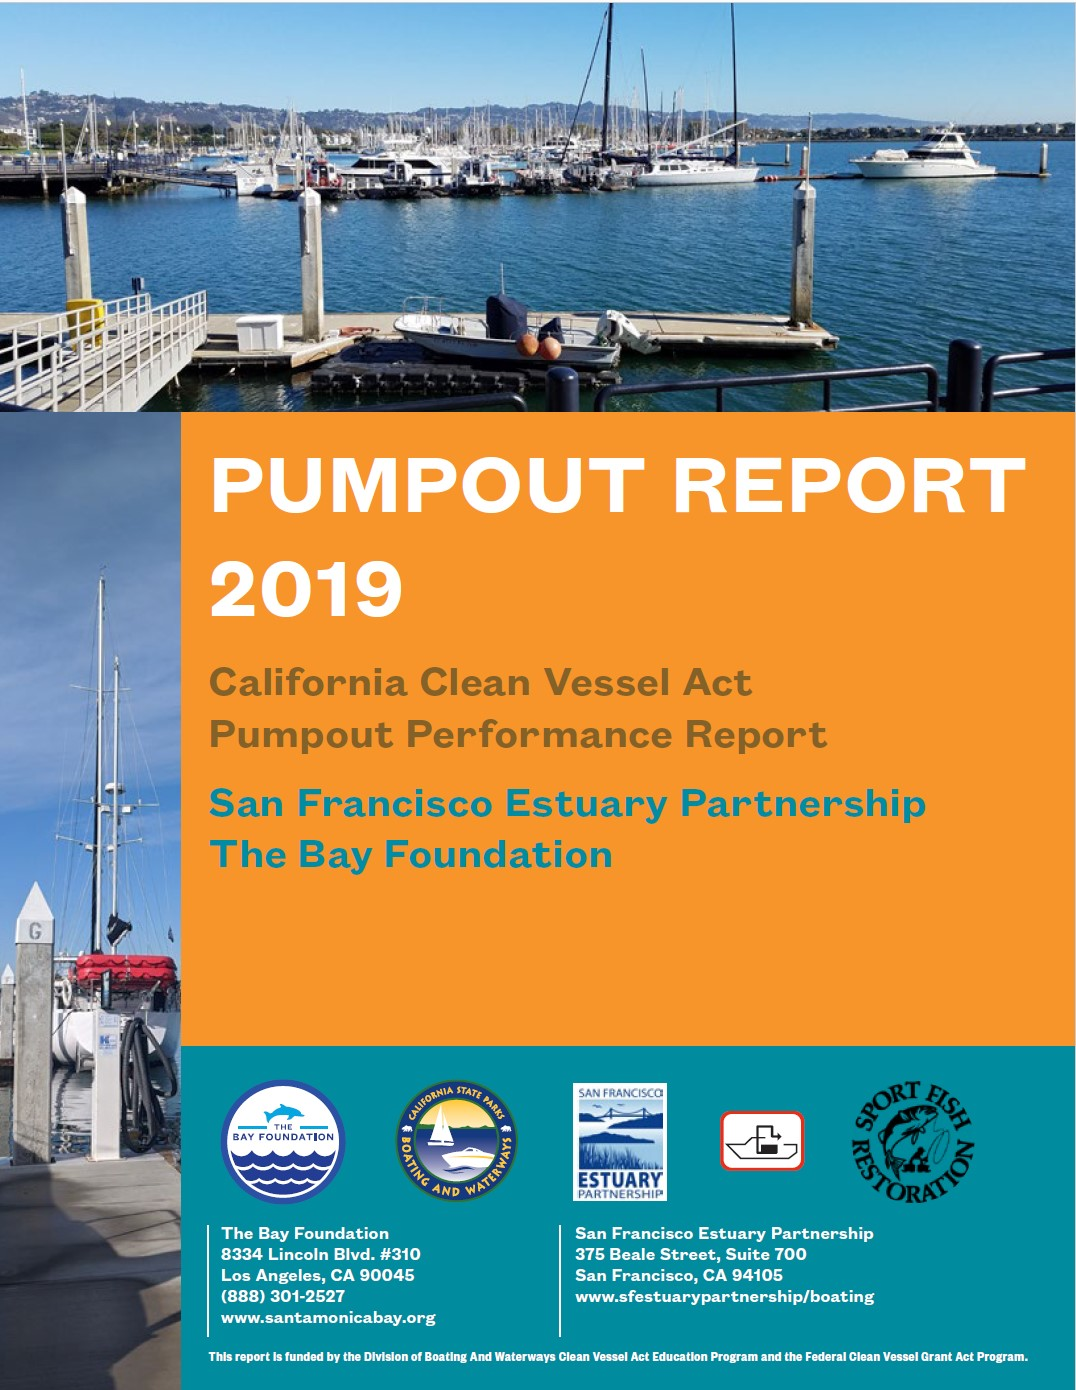 California Pumpout Report 2019